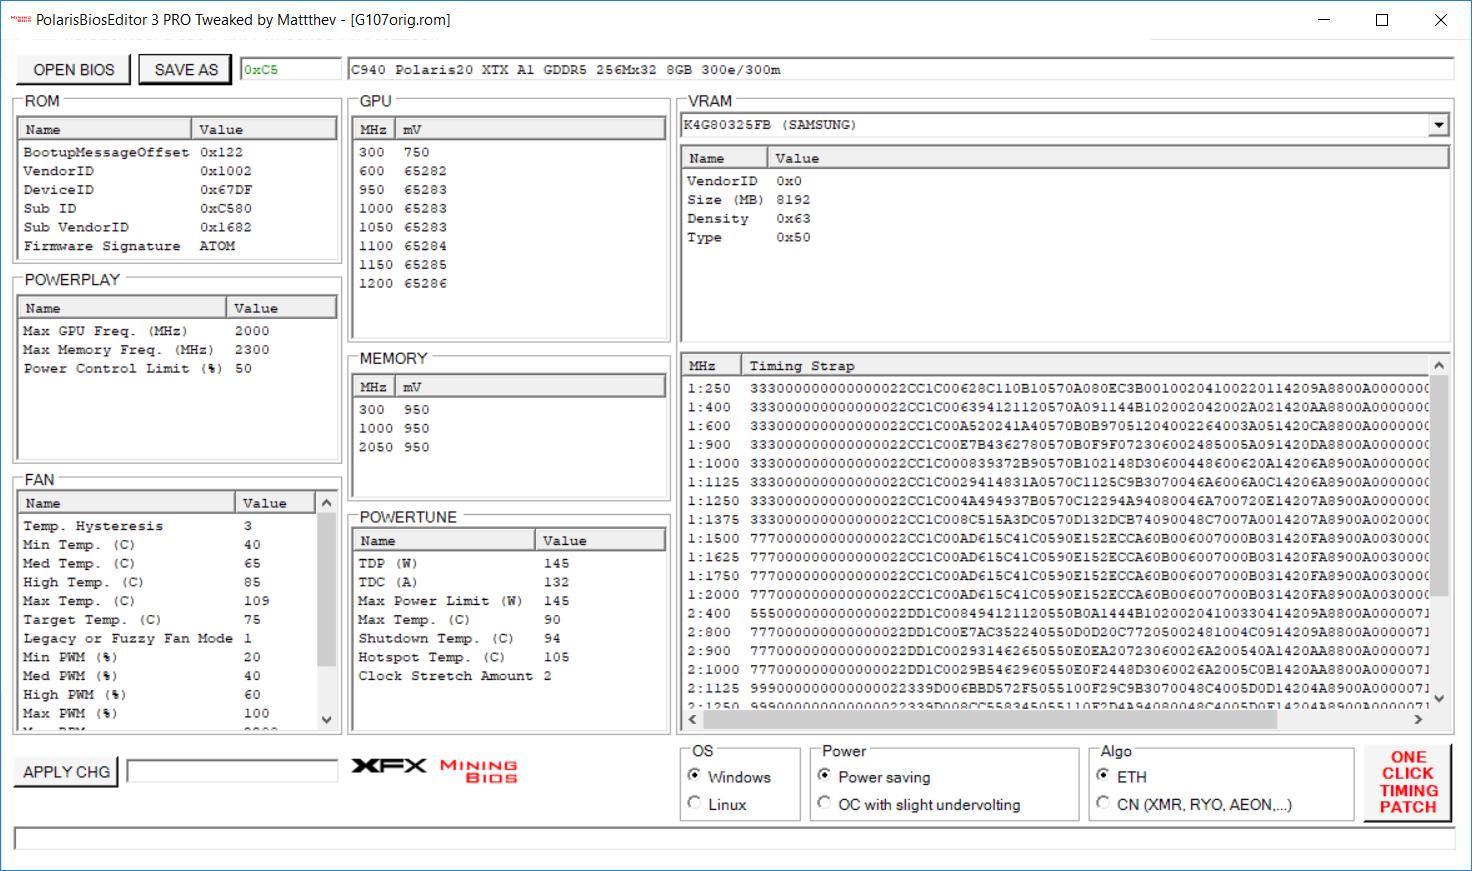 Polaris Bios Editor 3 PRO - Download PBE 3 Pro for Windows 7/10 (32/64-bit)